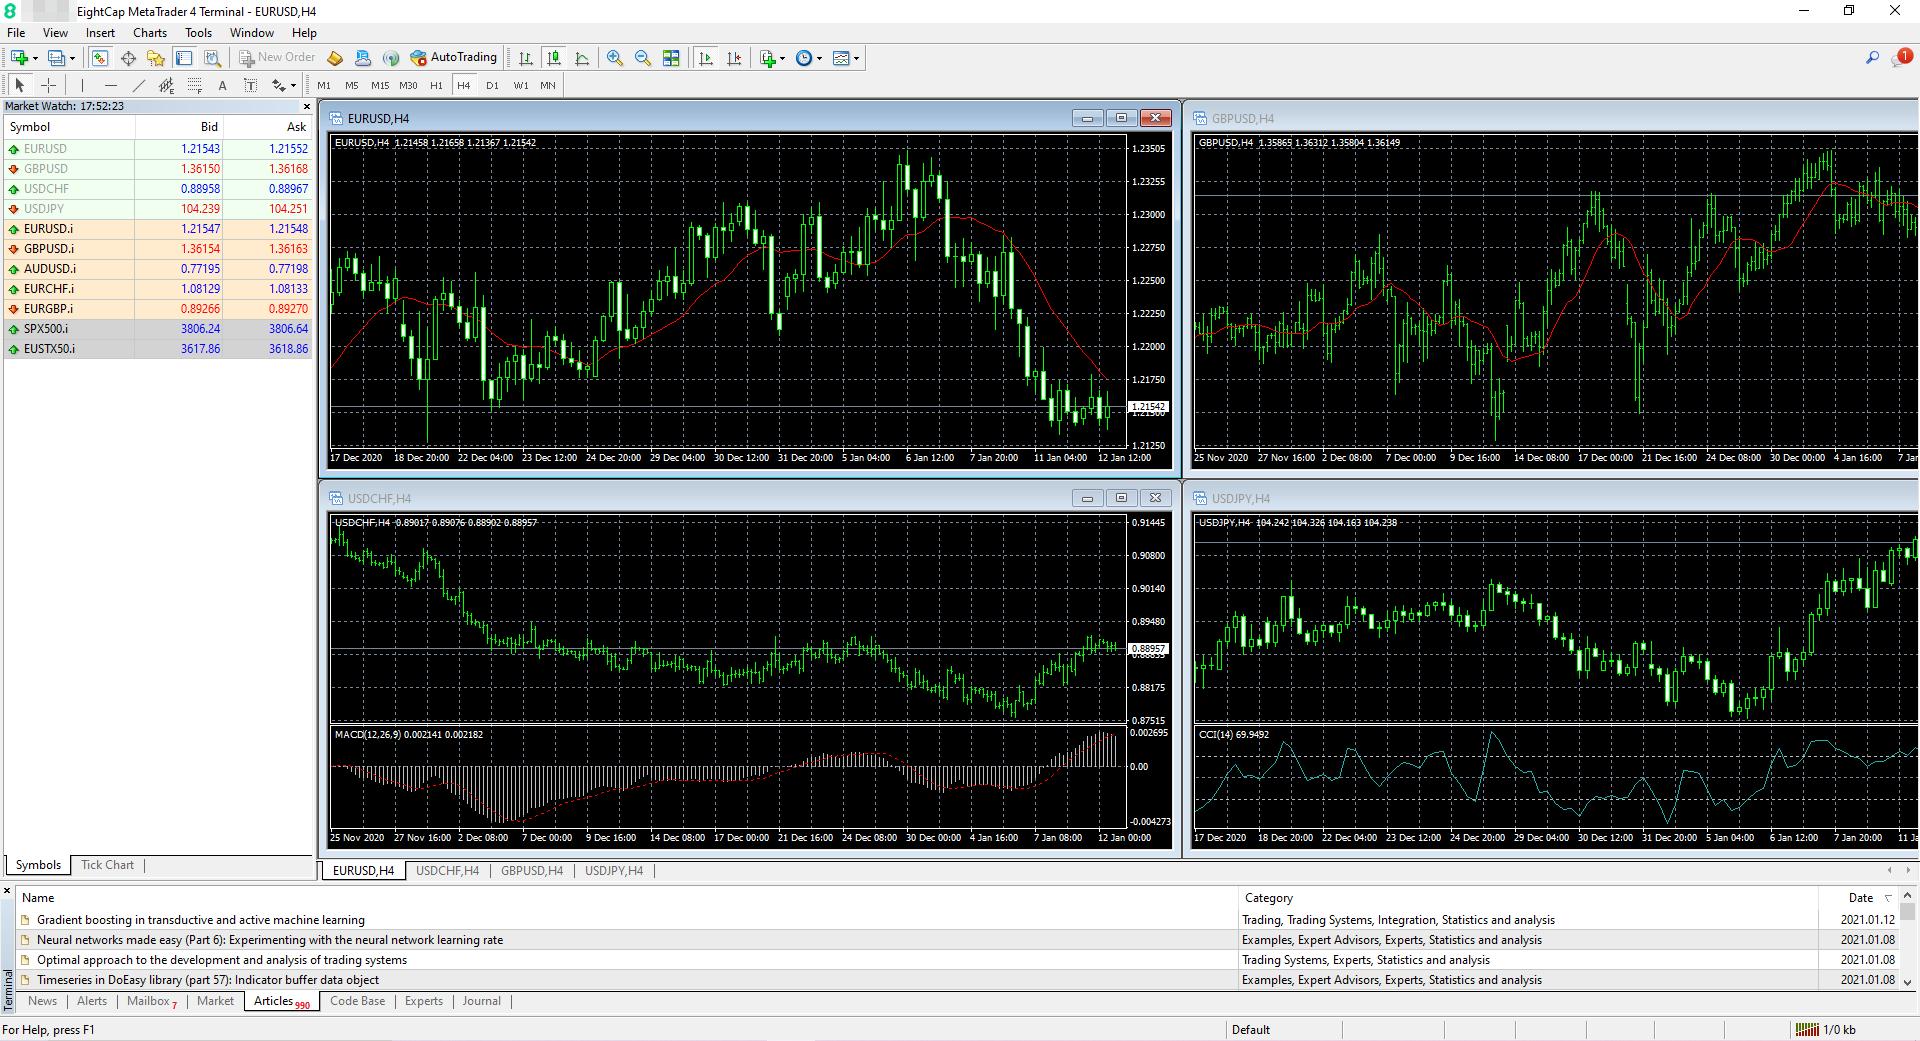 Eightcap review - Desktop trading platform